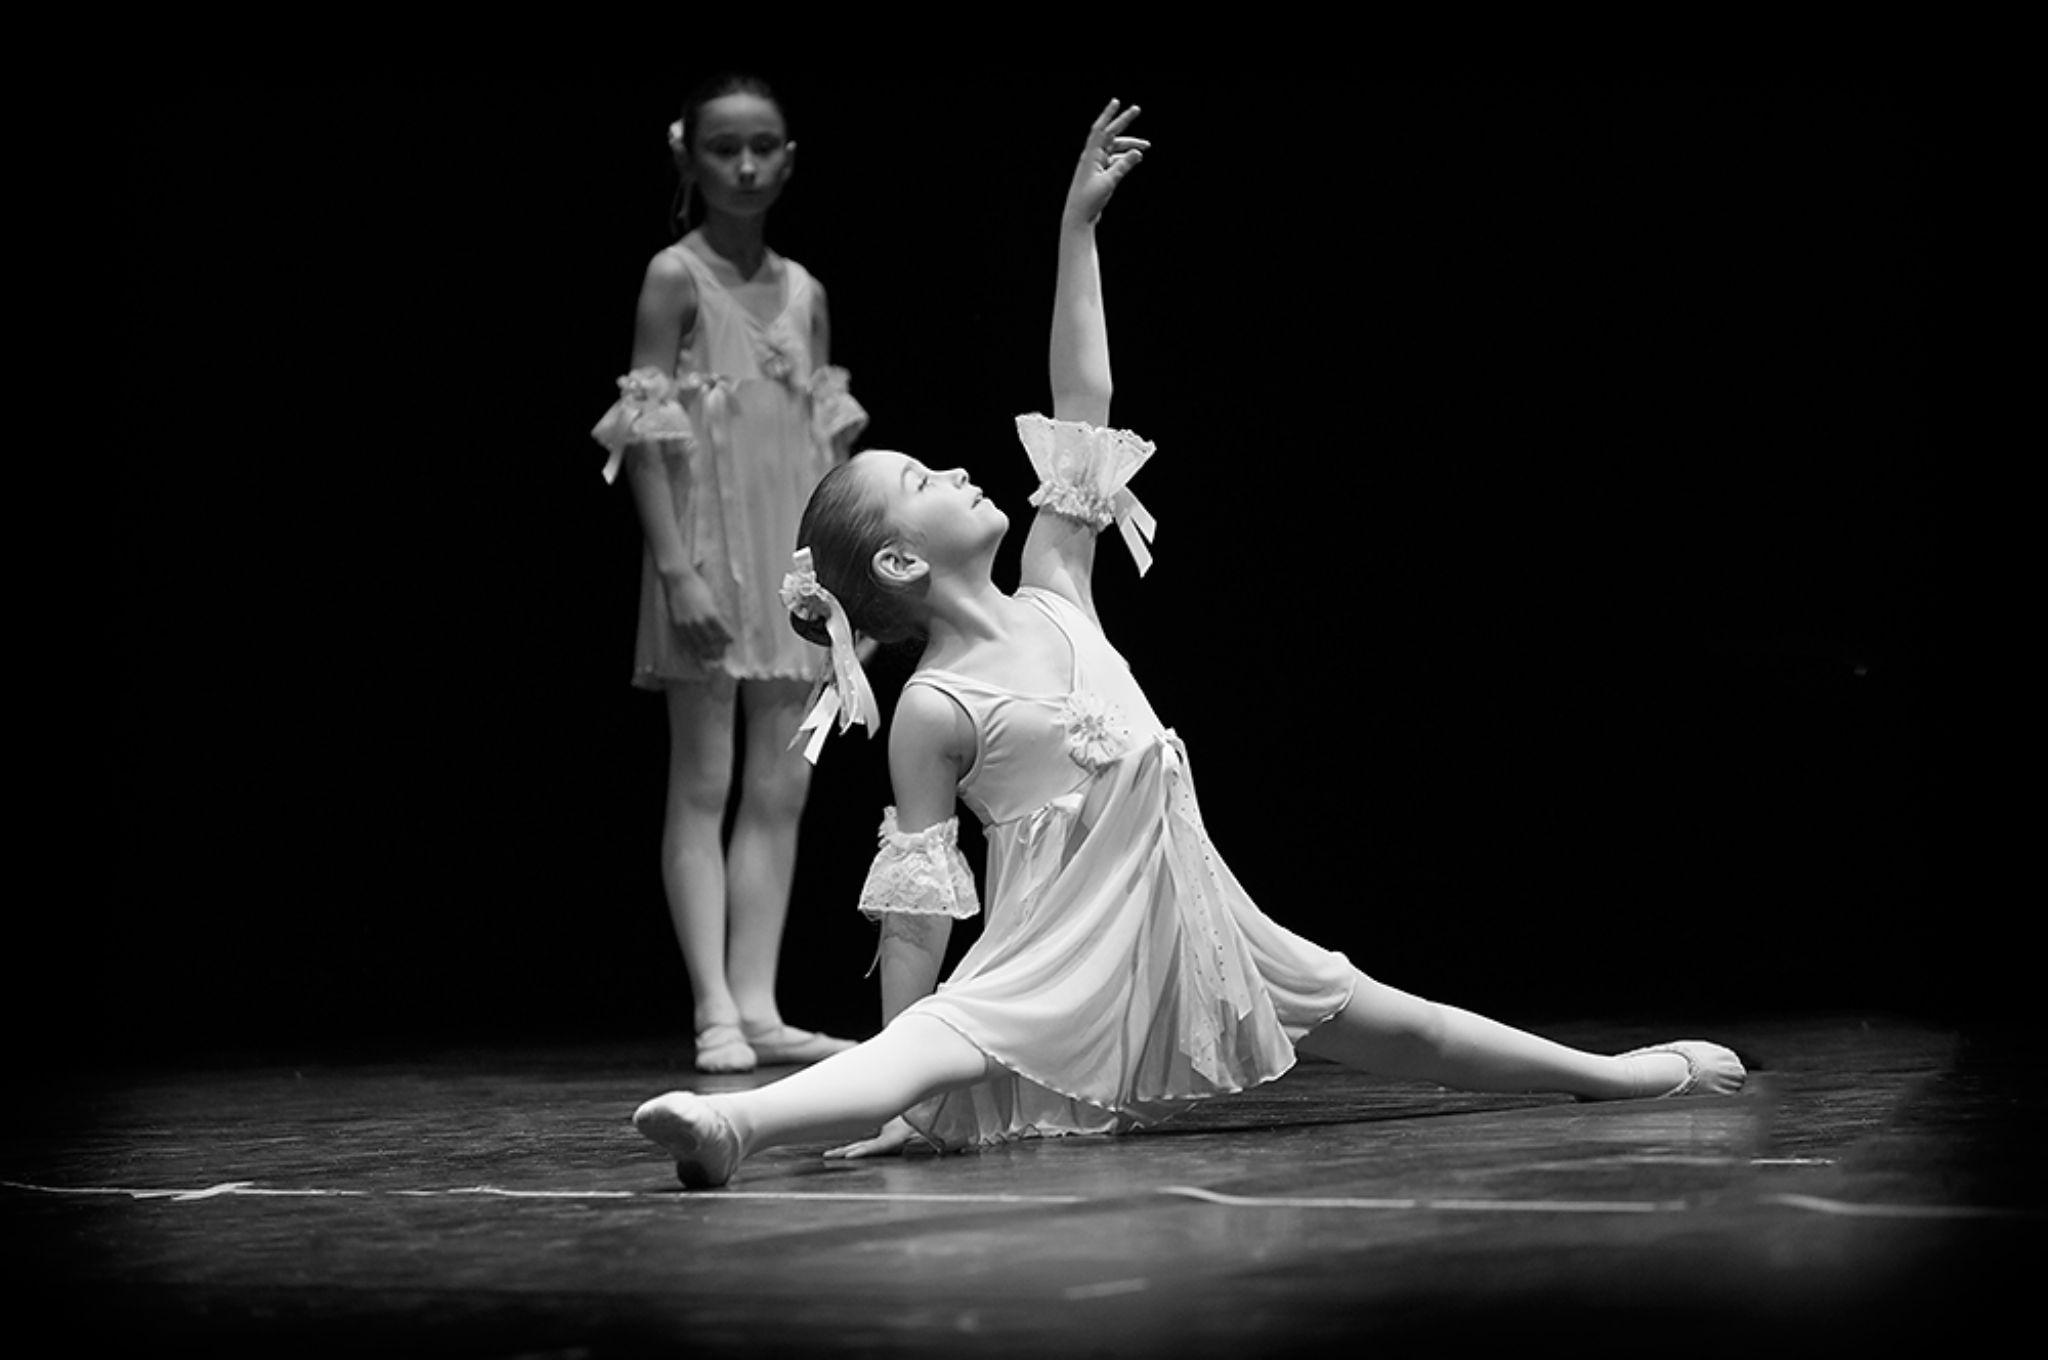 Dance is Life by Lorenzo Bruno